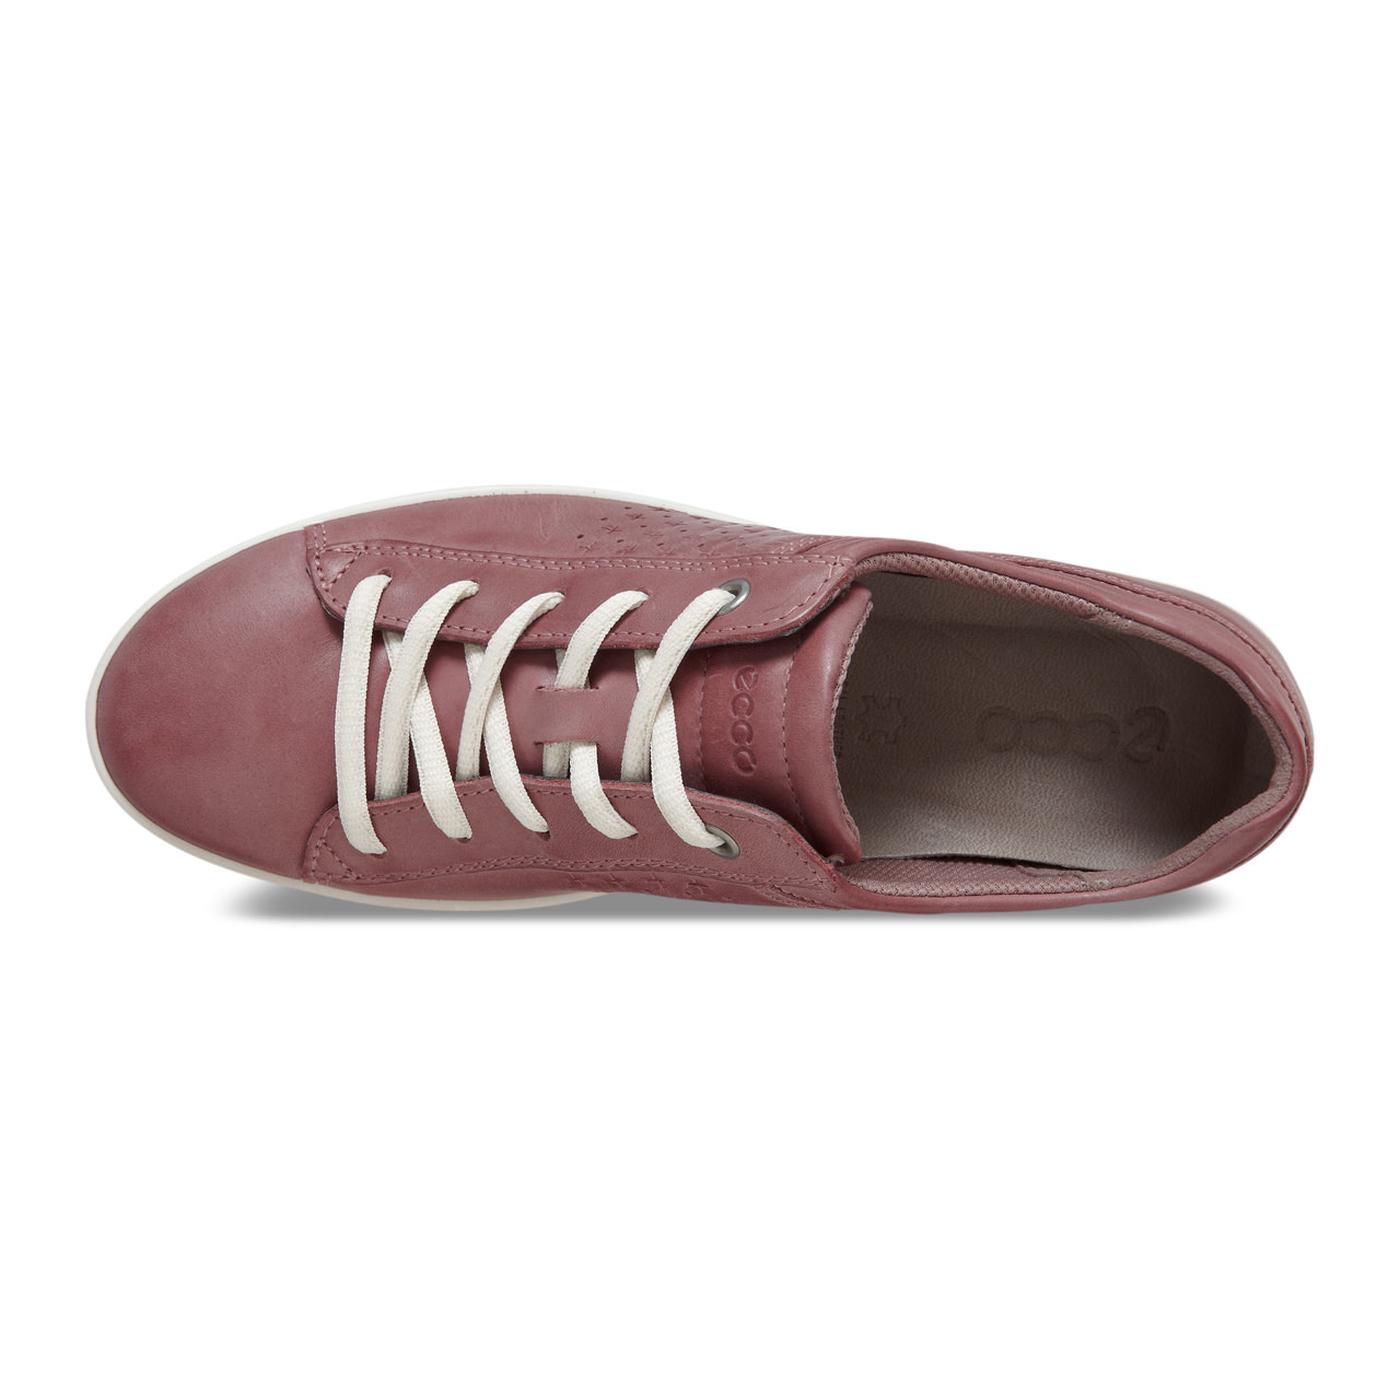 ECCO FARA Shoe